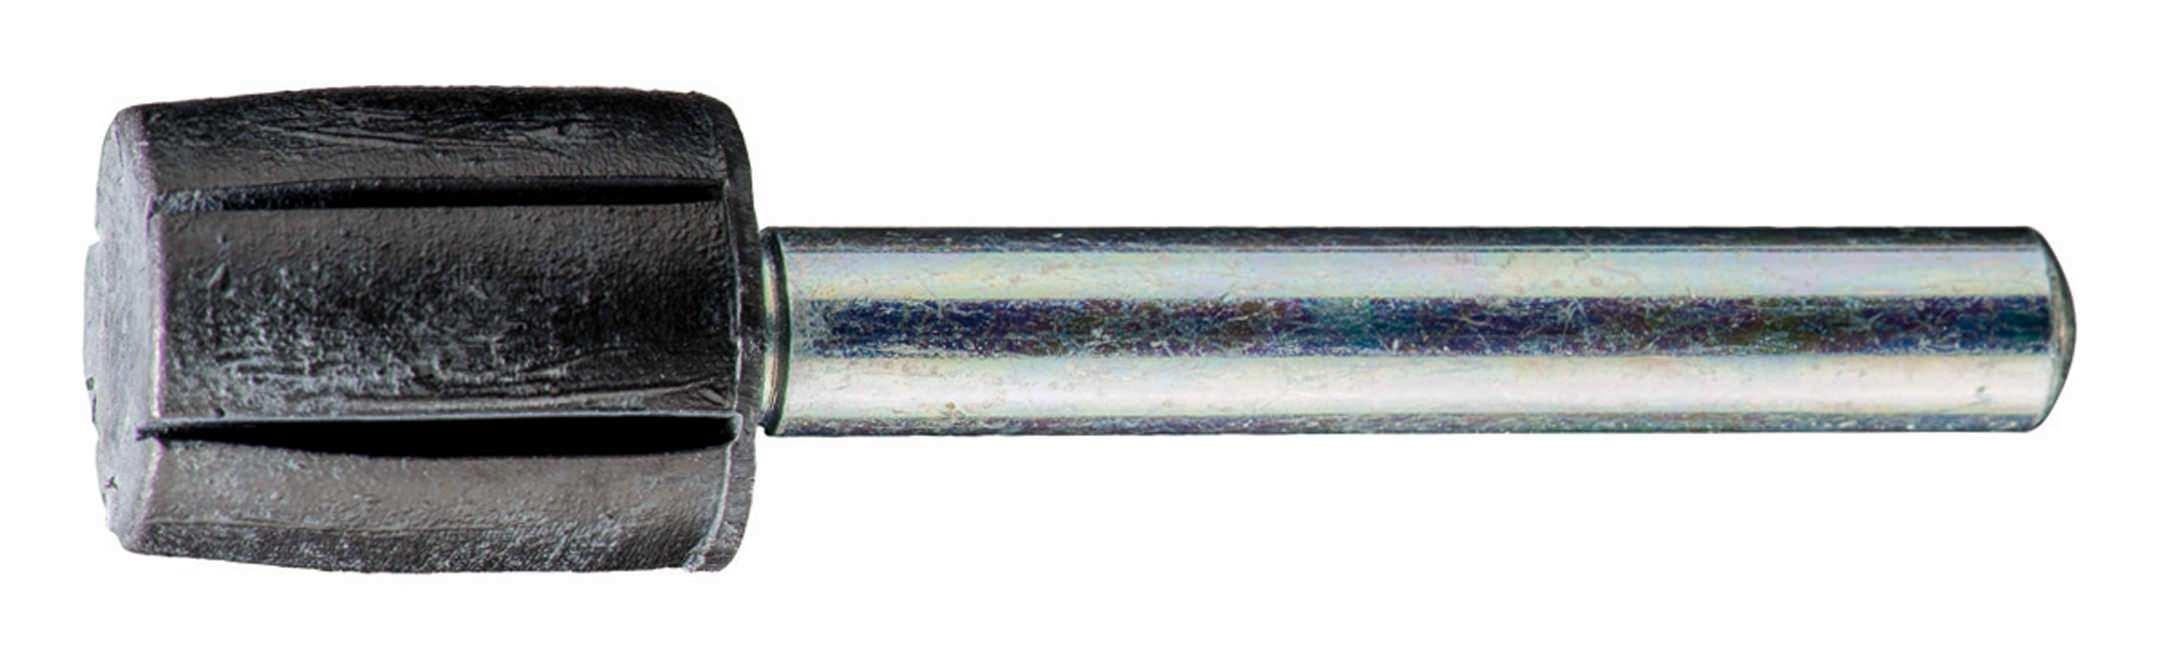 5x PFERD Schleifhülsenträger 15x30 Form Zylinder